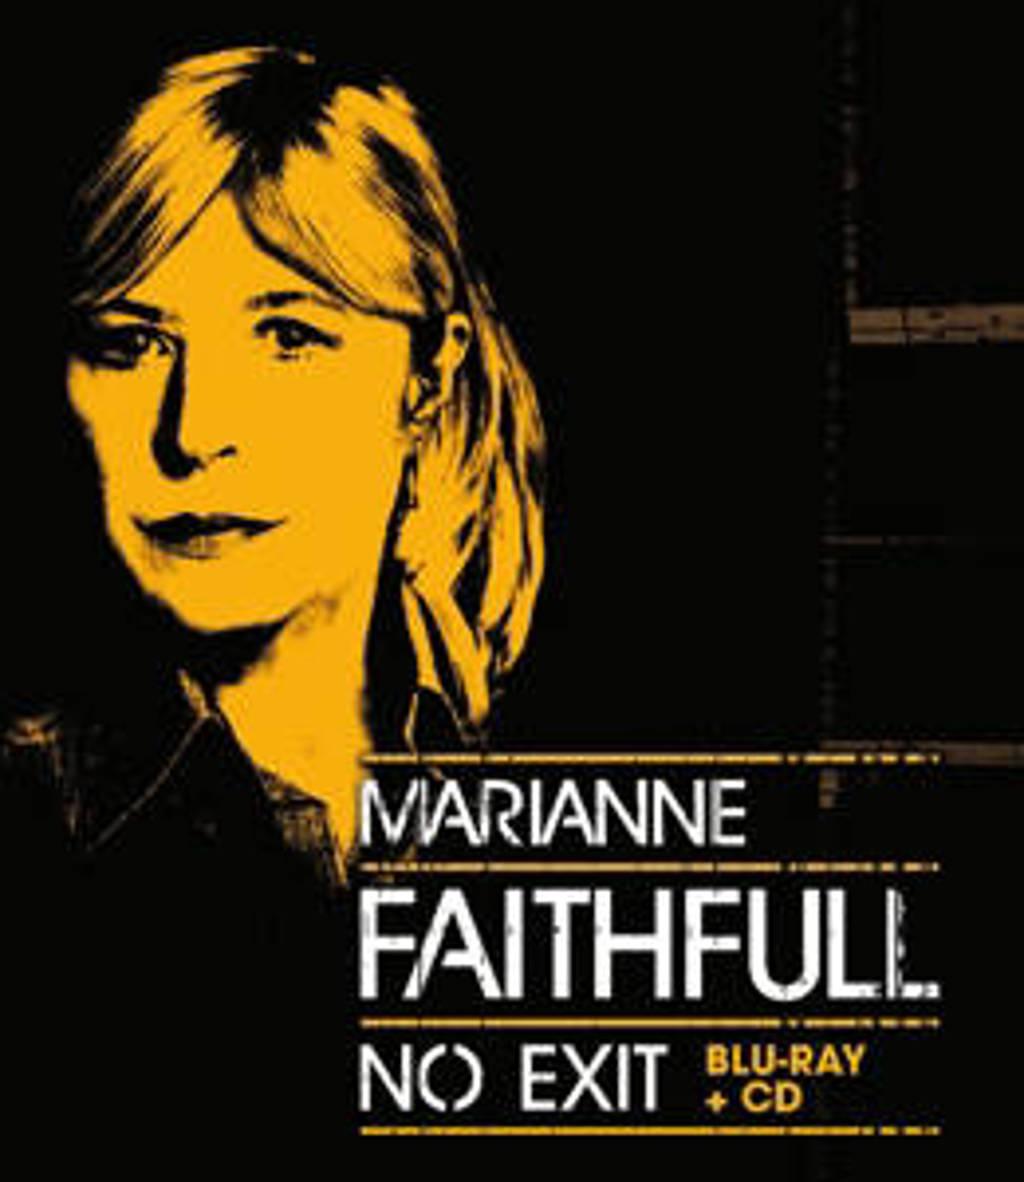 Marianne Faithfull - No Exit (Blu-ray)